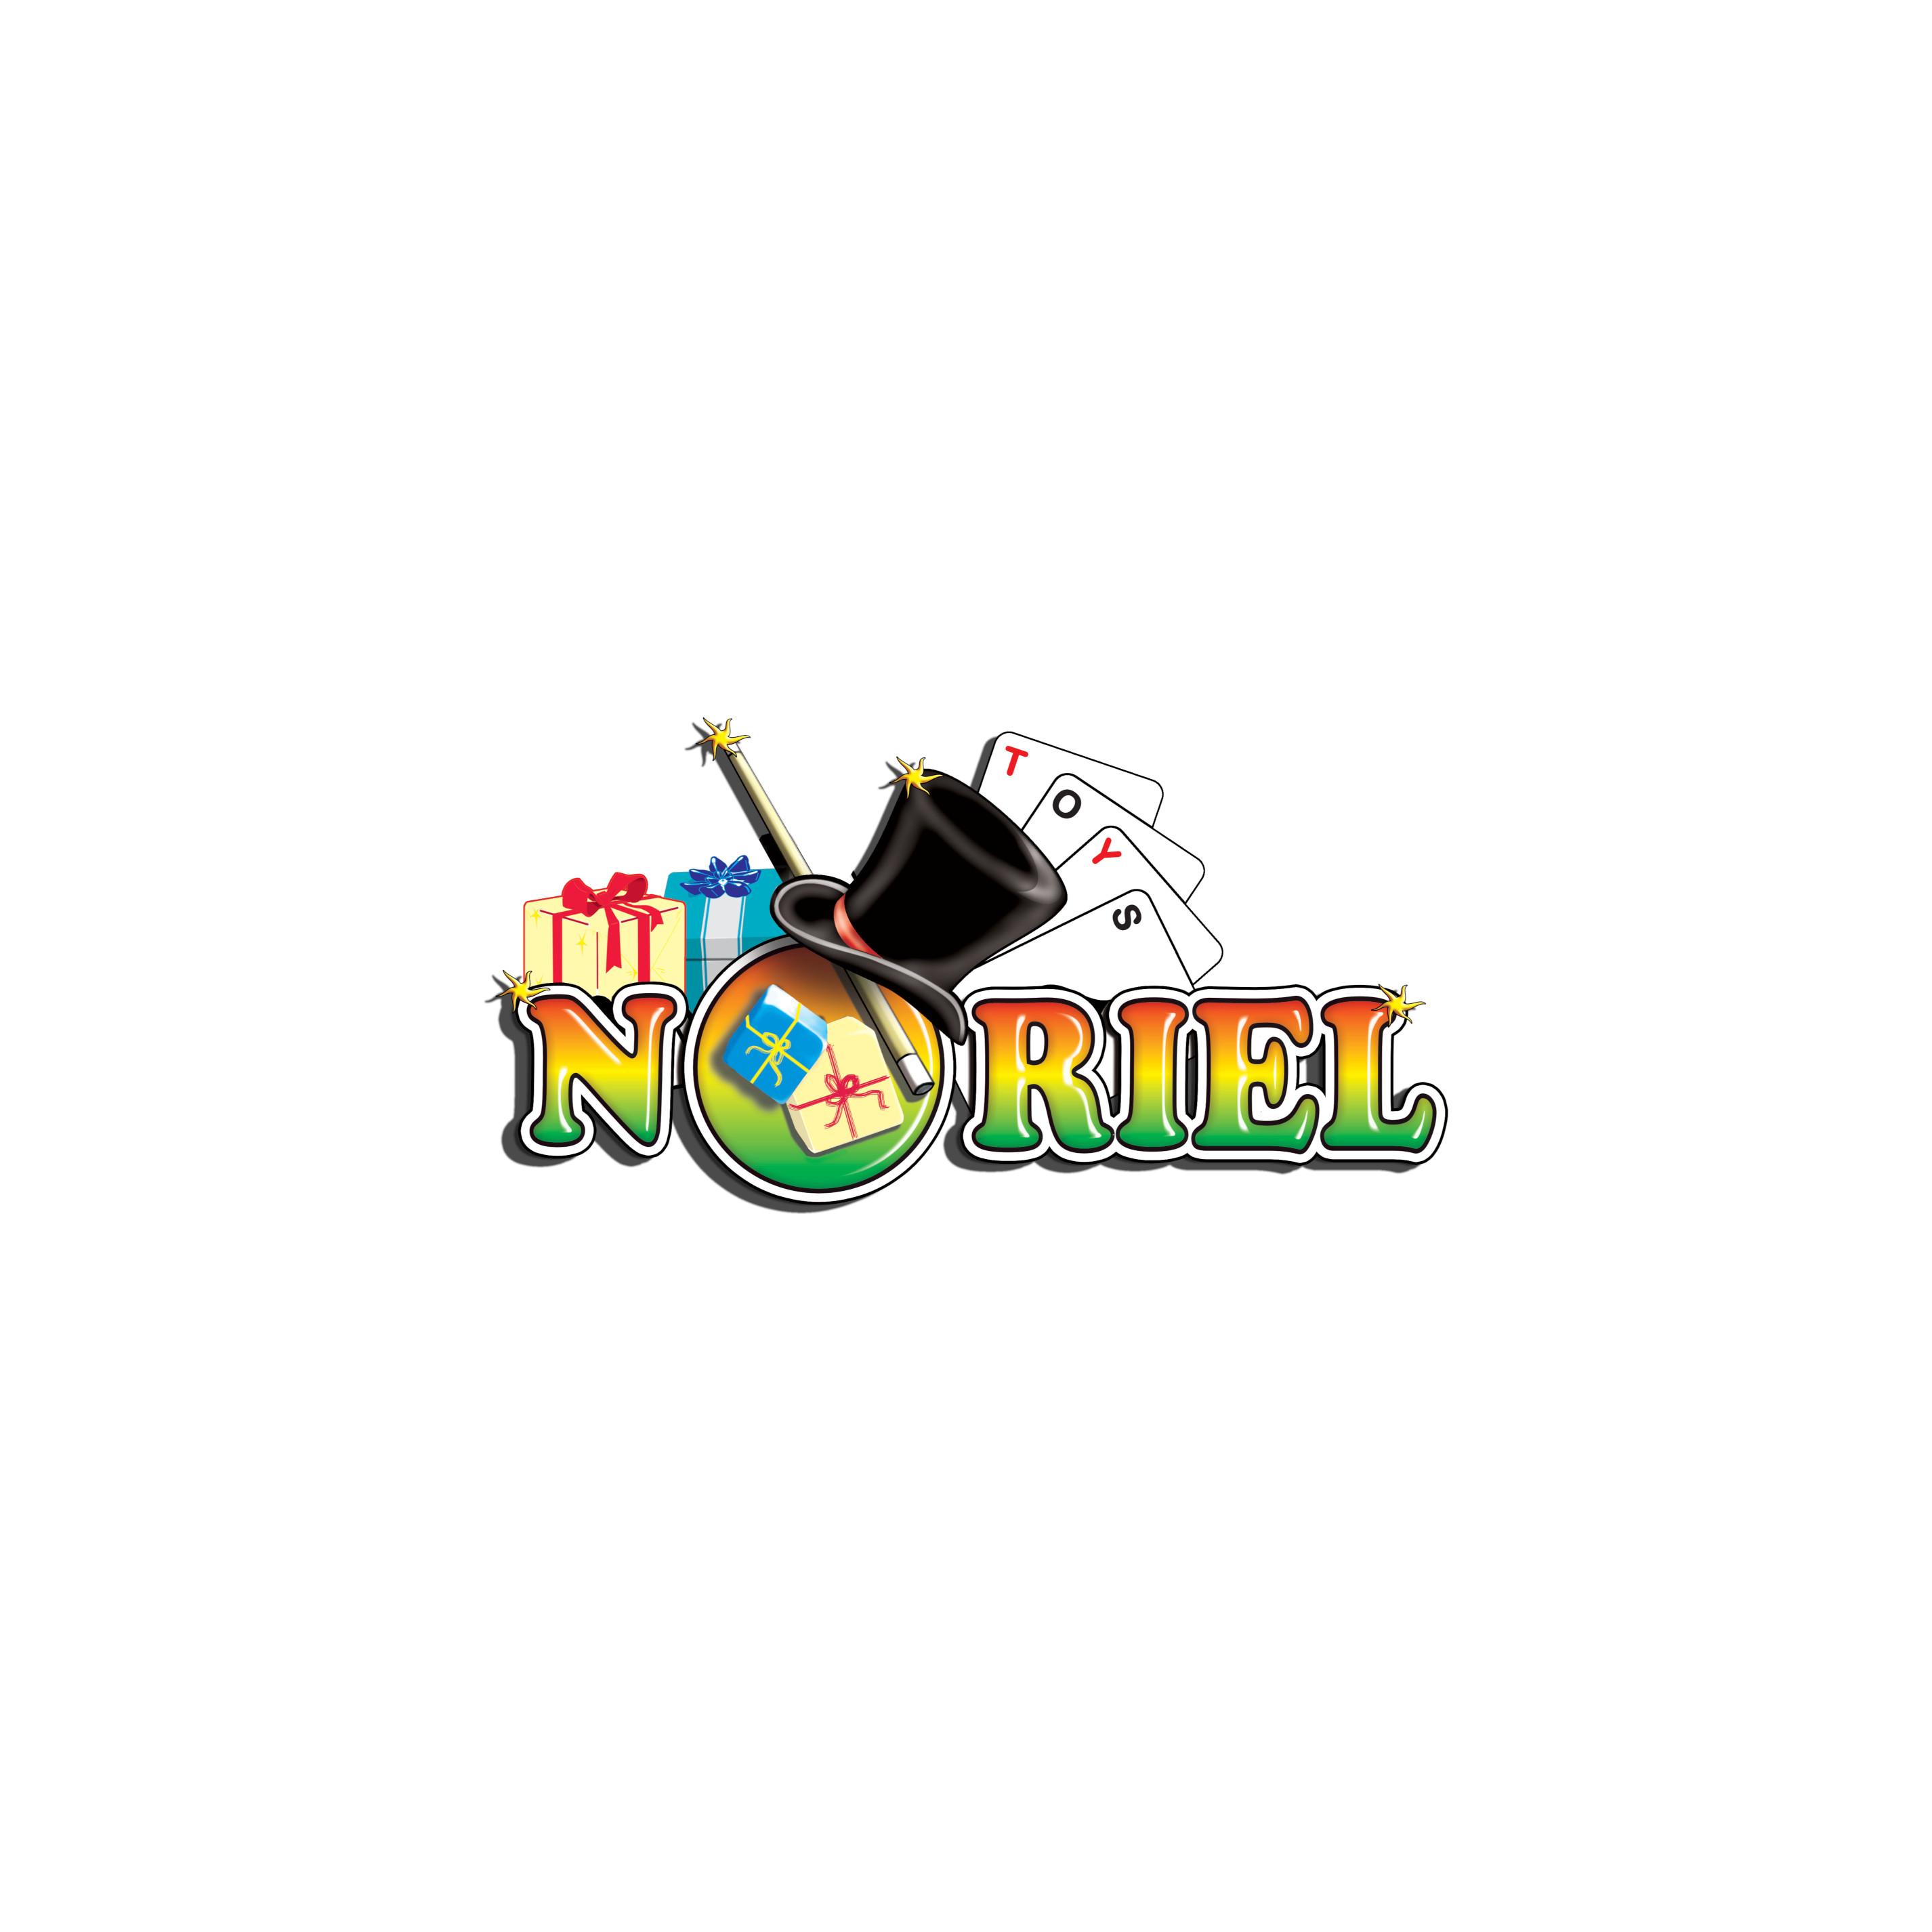 Figurina Transformers Playskool Heroes Rescue Bots - Silverback The Gorilla